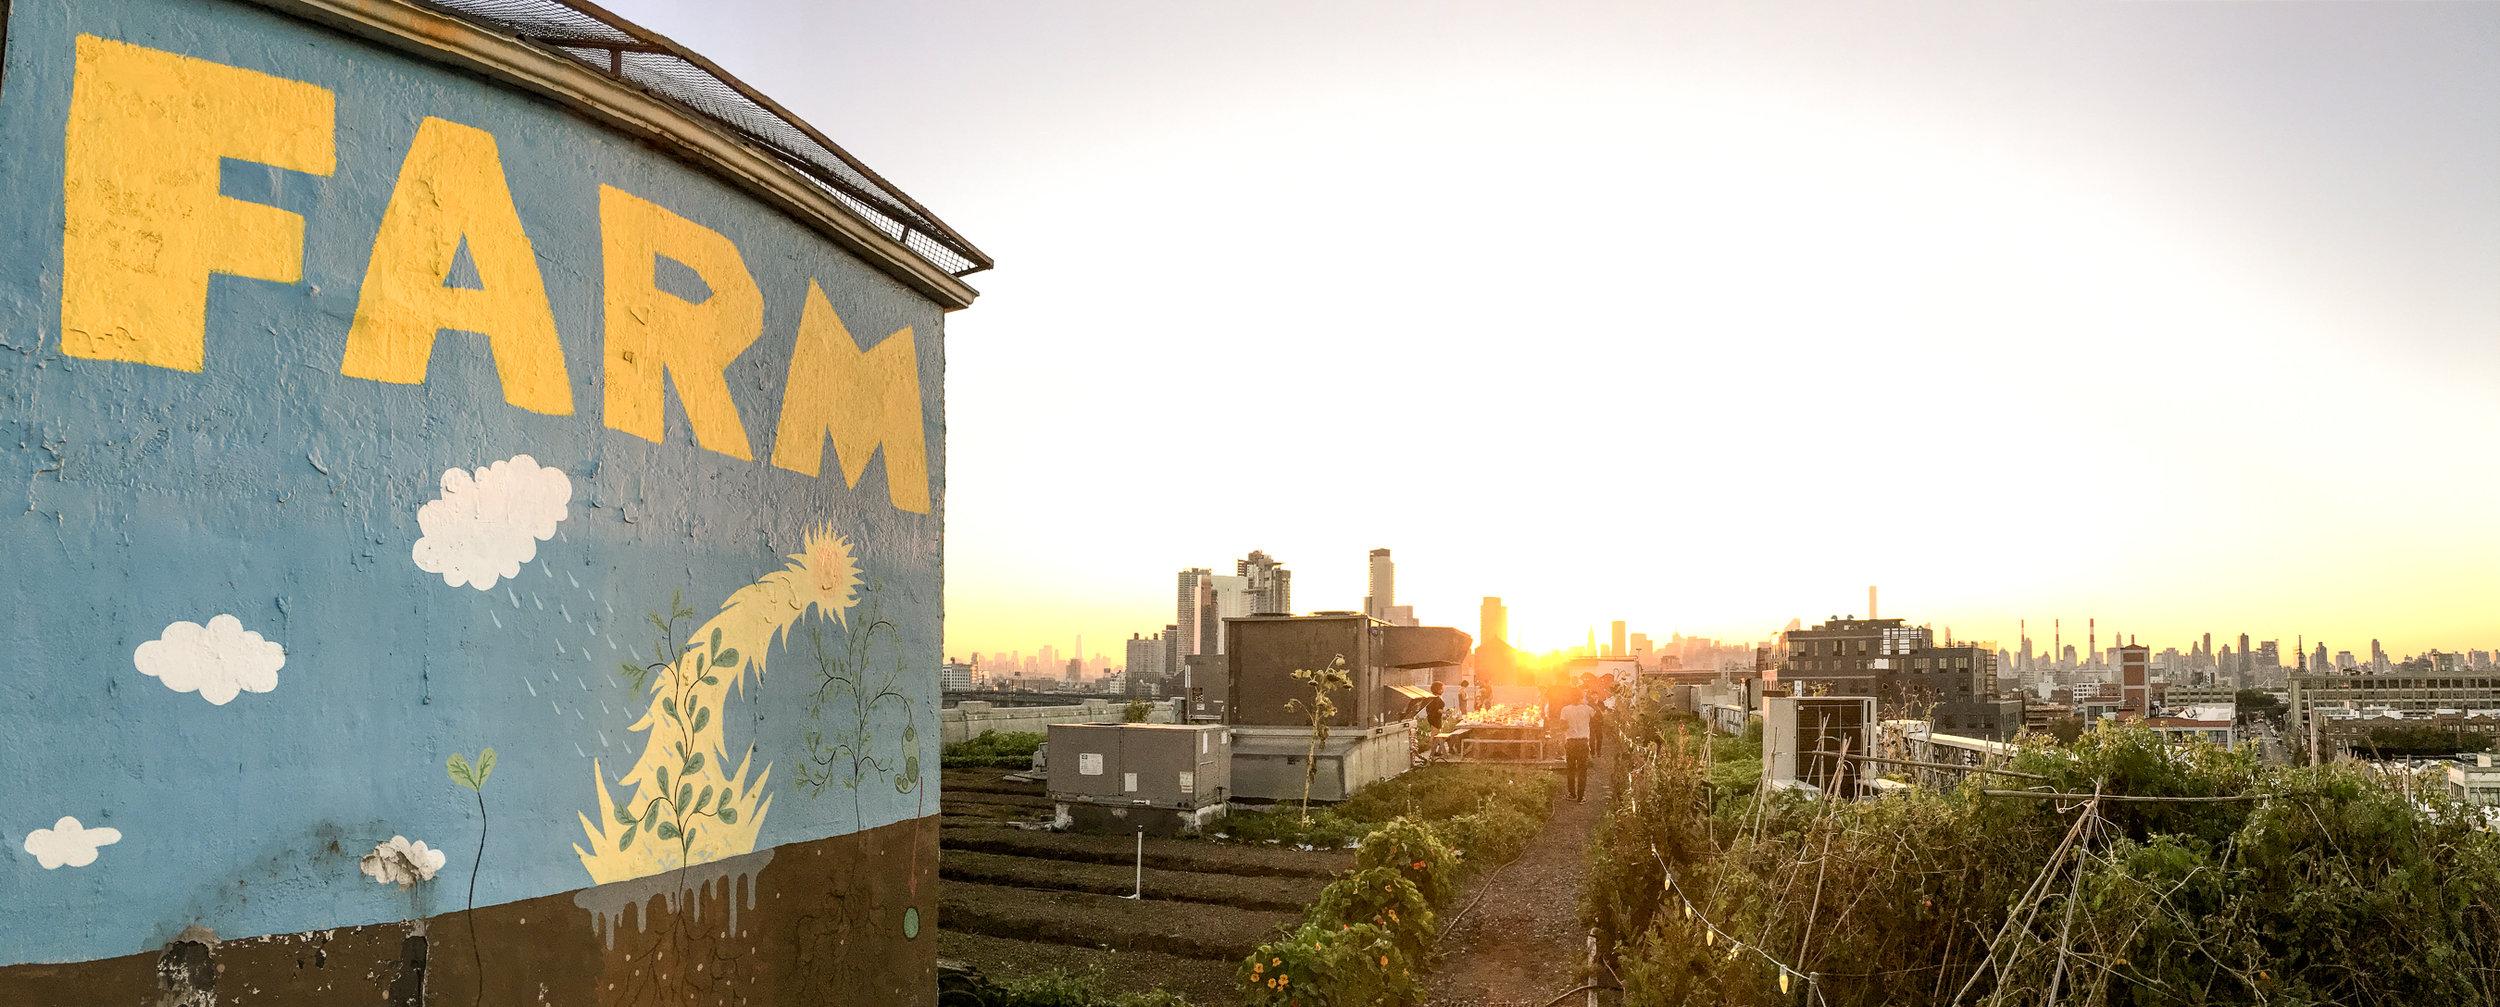 Brooklyn Grange Dinner | leavethesandwich.com #brooklyngrange #farm #nyc #travelideas